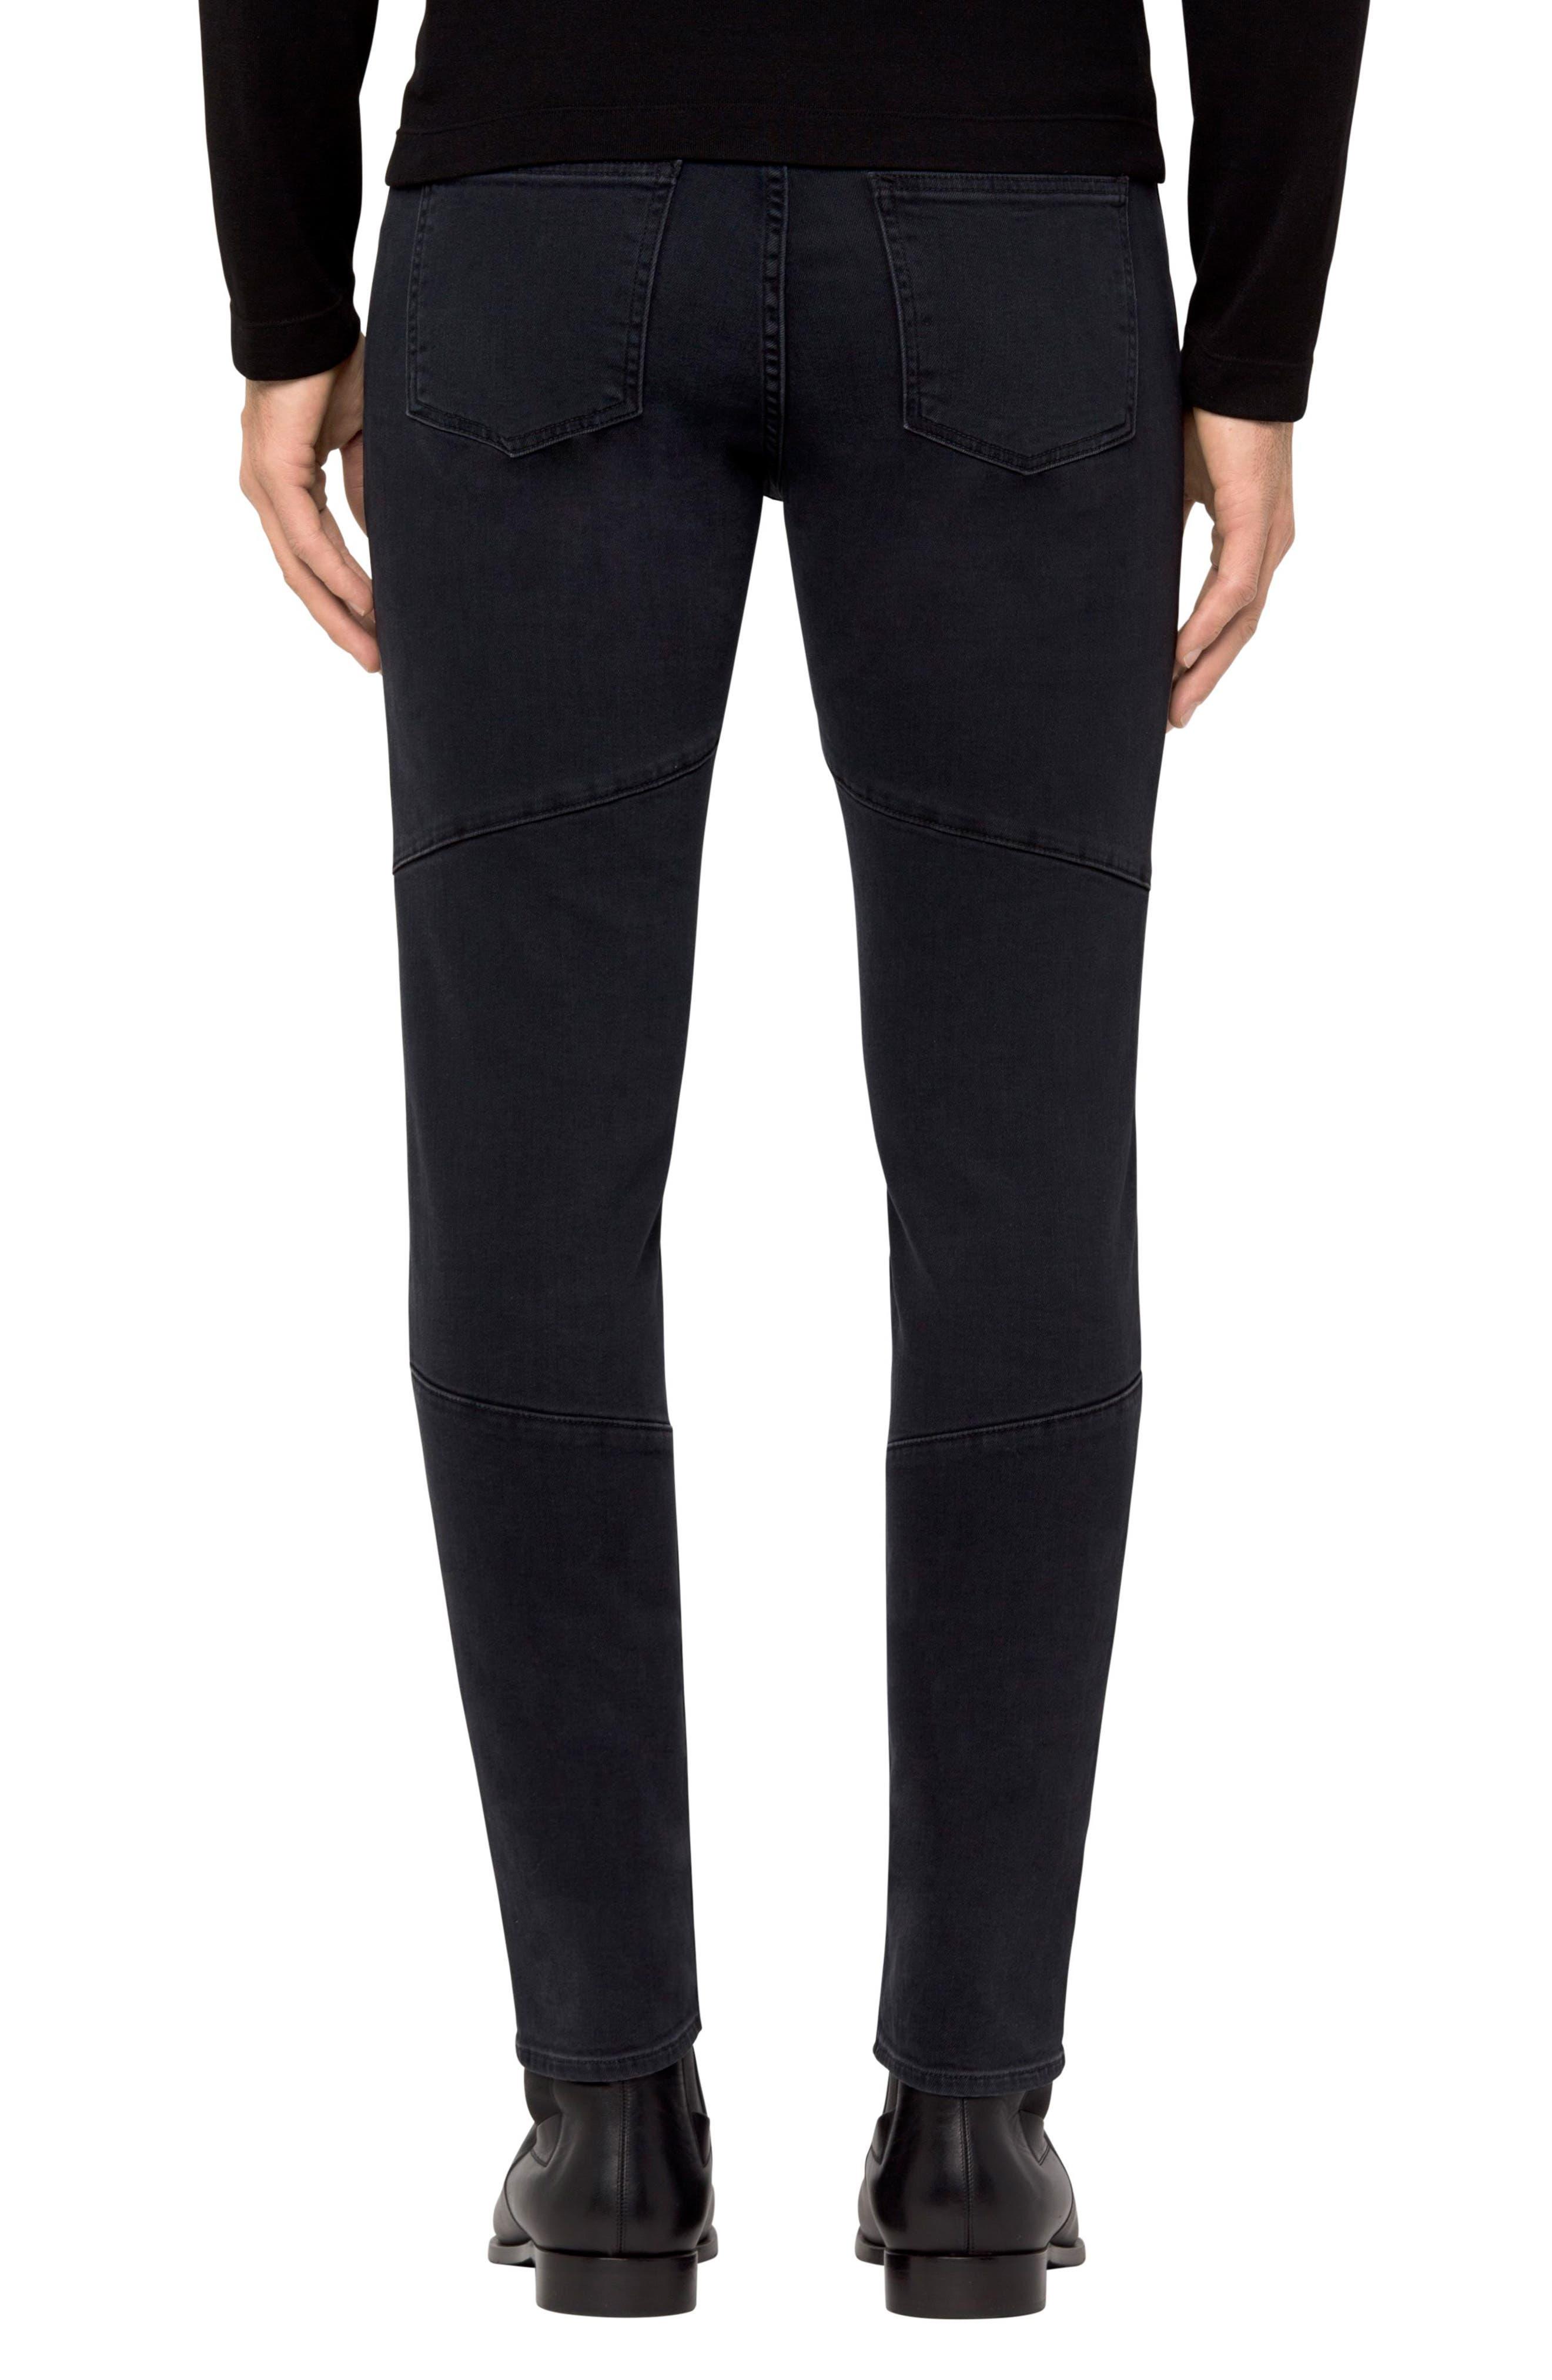 Bearden Moto Skinny Fit Jeans,                             Alternate thumbnail 2, color,                             002